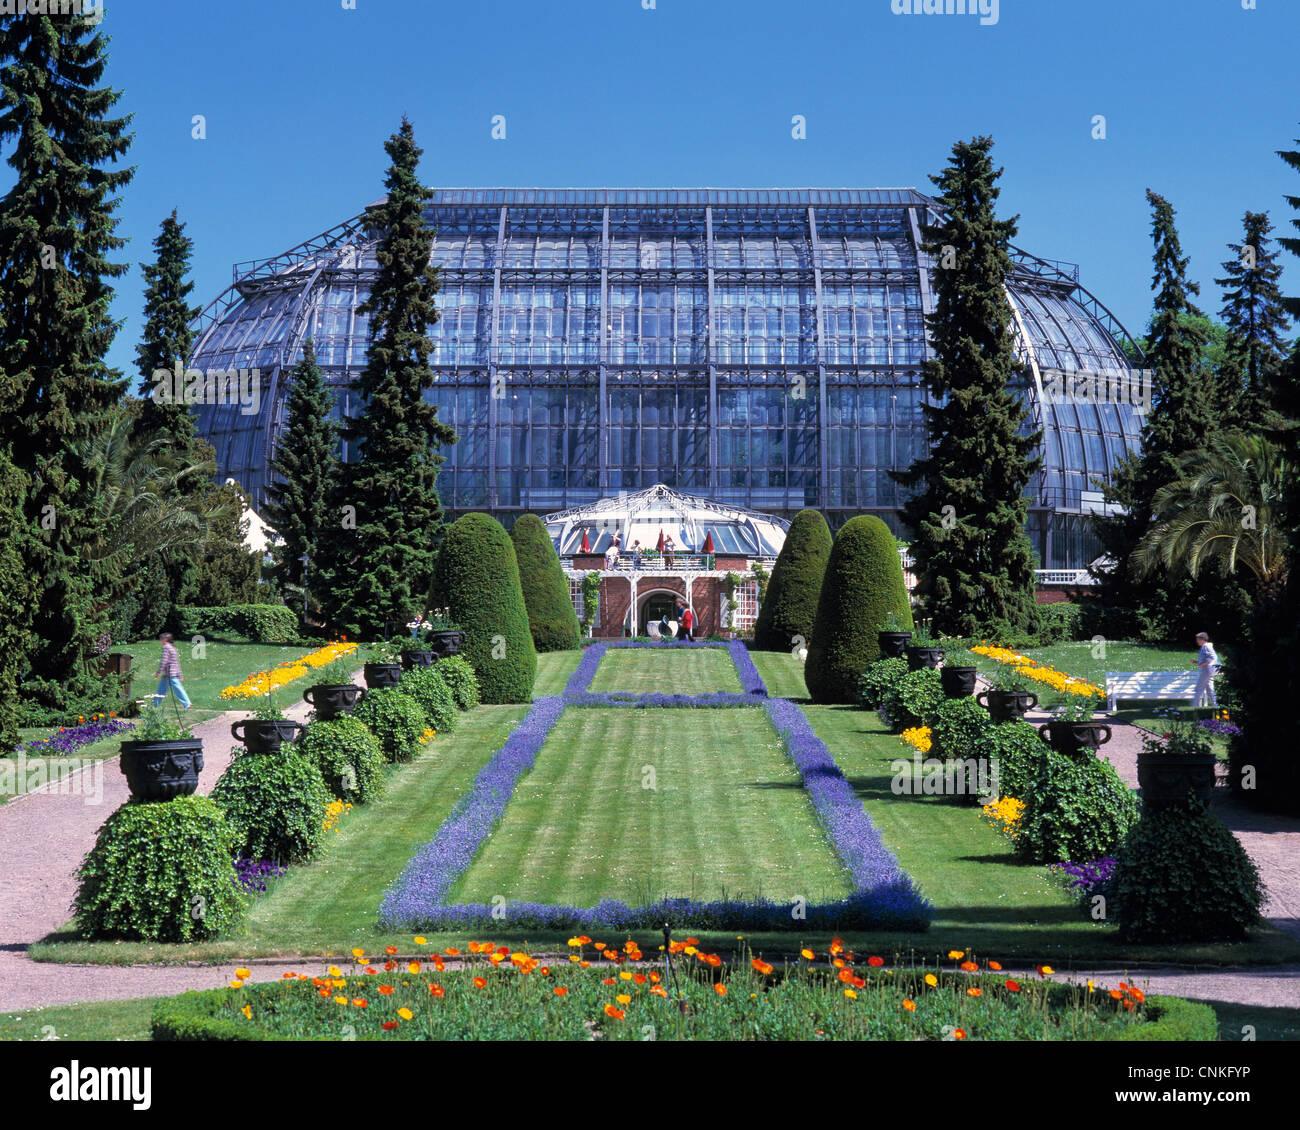 Botanischer Garten Und Botanisches Museum Berlin Dahlem Stock Photos